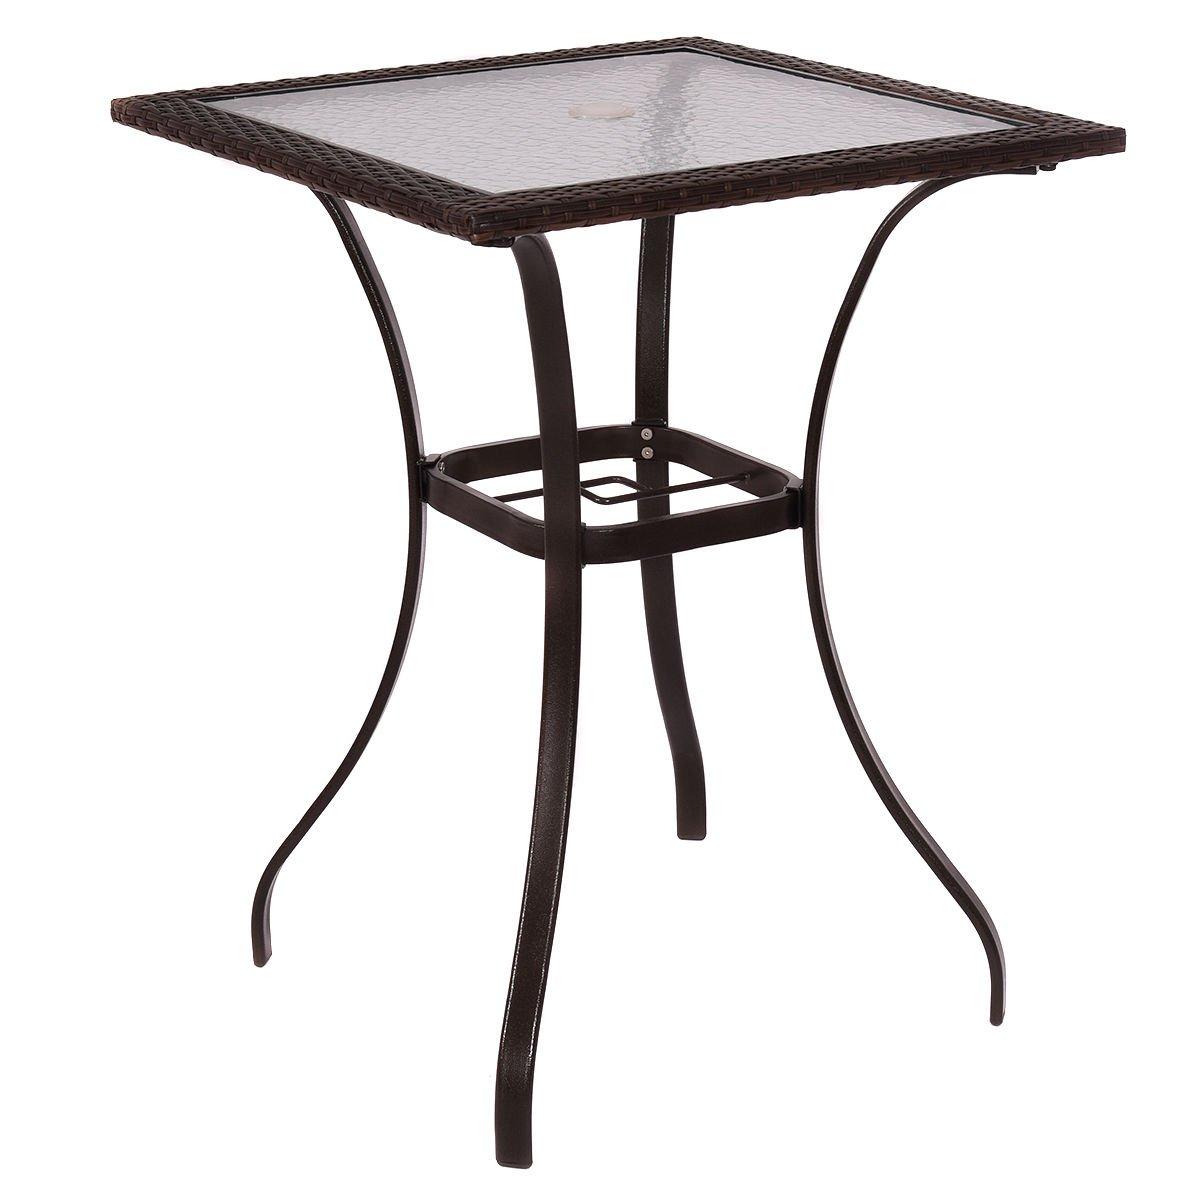 Asher Amada Outdoor Patio Rattan Wicker Bar Square Table Glass Top Yard Garden Furniture